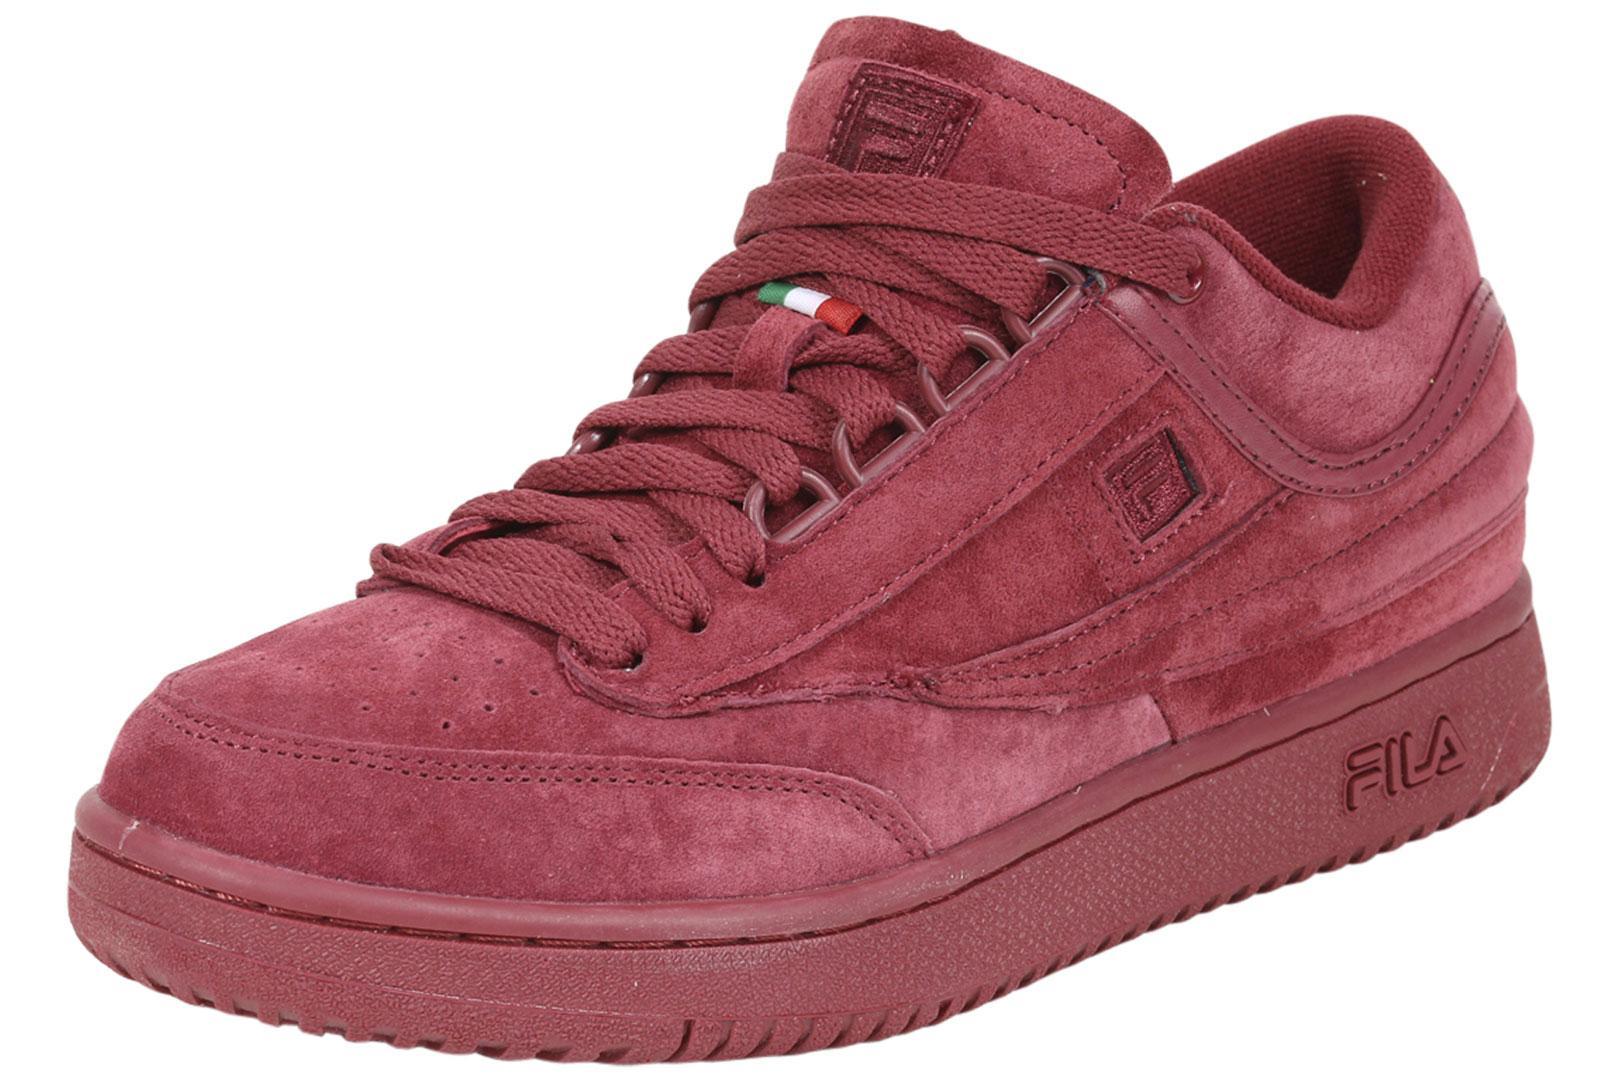 Fila Men's T 1 Mid Premium Sneakers Shoes